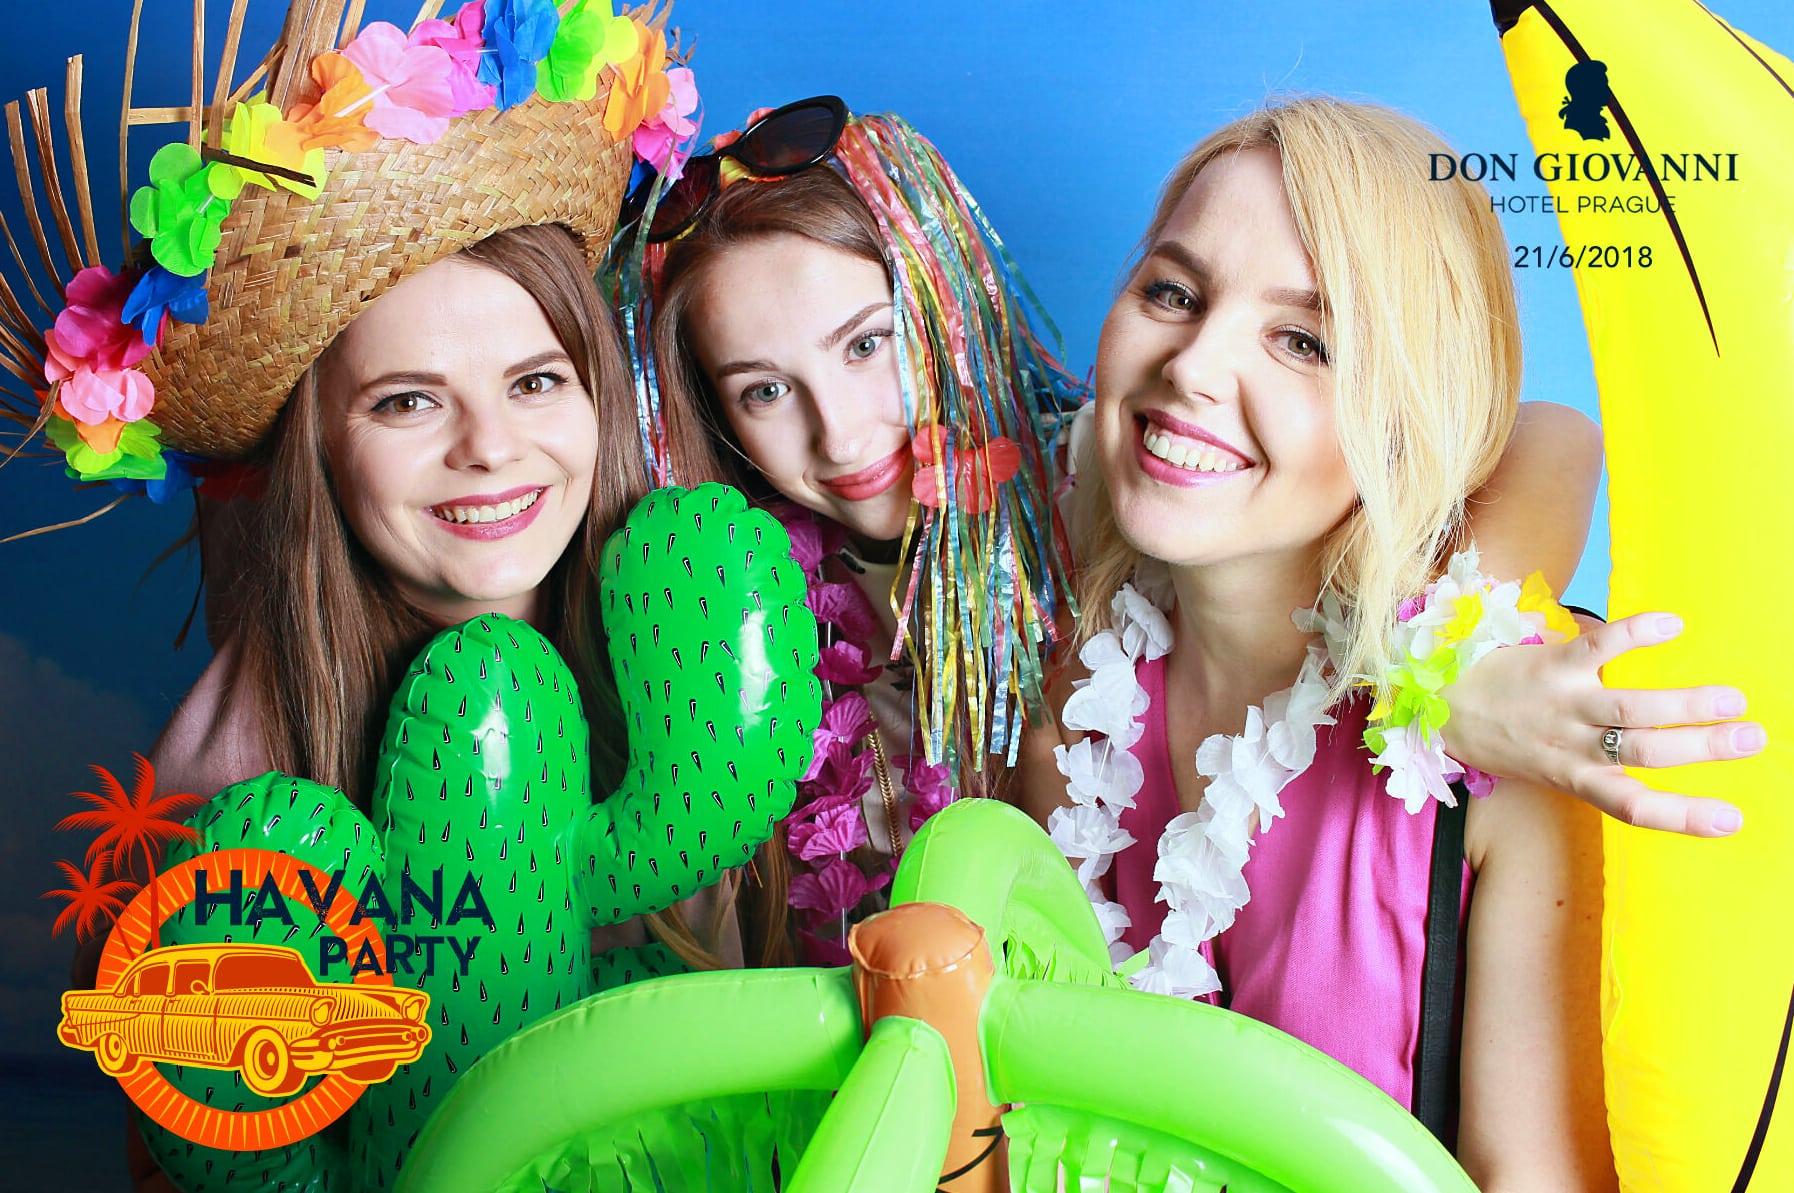 fotokoutek-don-giovanni-hotel-prague-havana-party-21-6-2018-442308